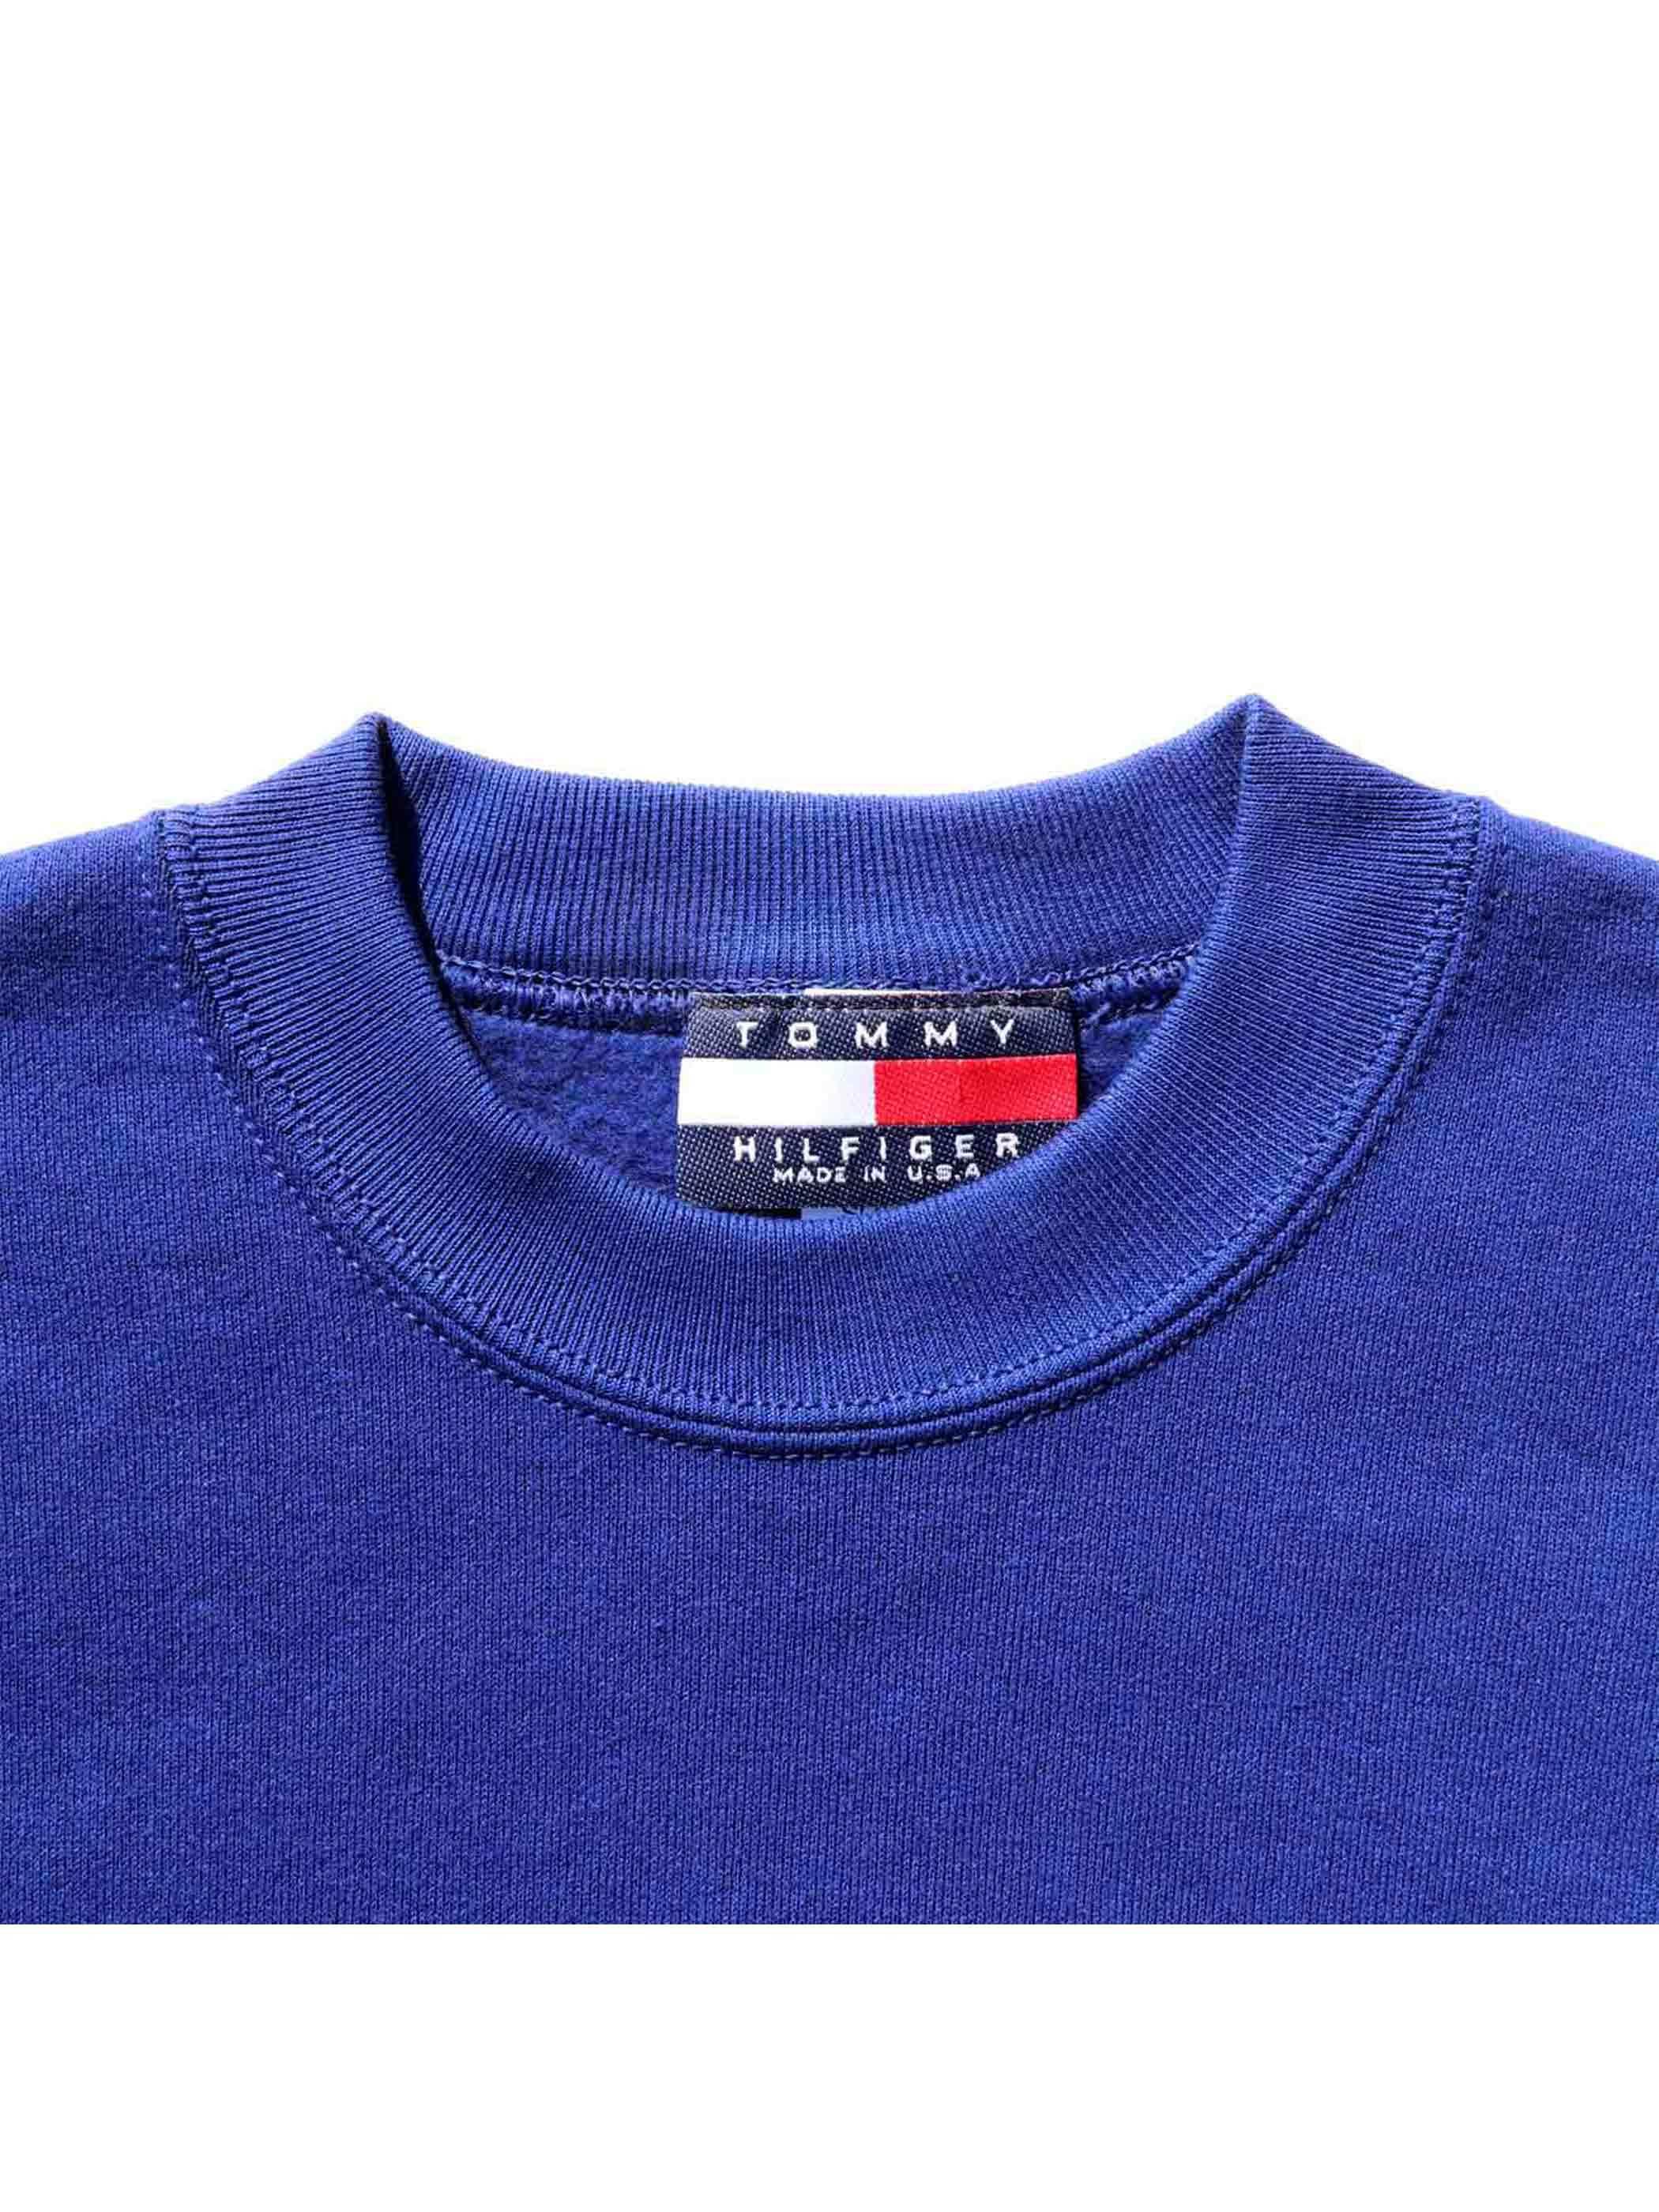 90's ブート TOMMY HILFIGER USA製 刺繍ロゴ スウェット [デッドストック] [L]